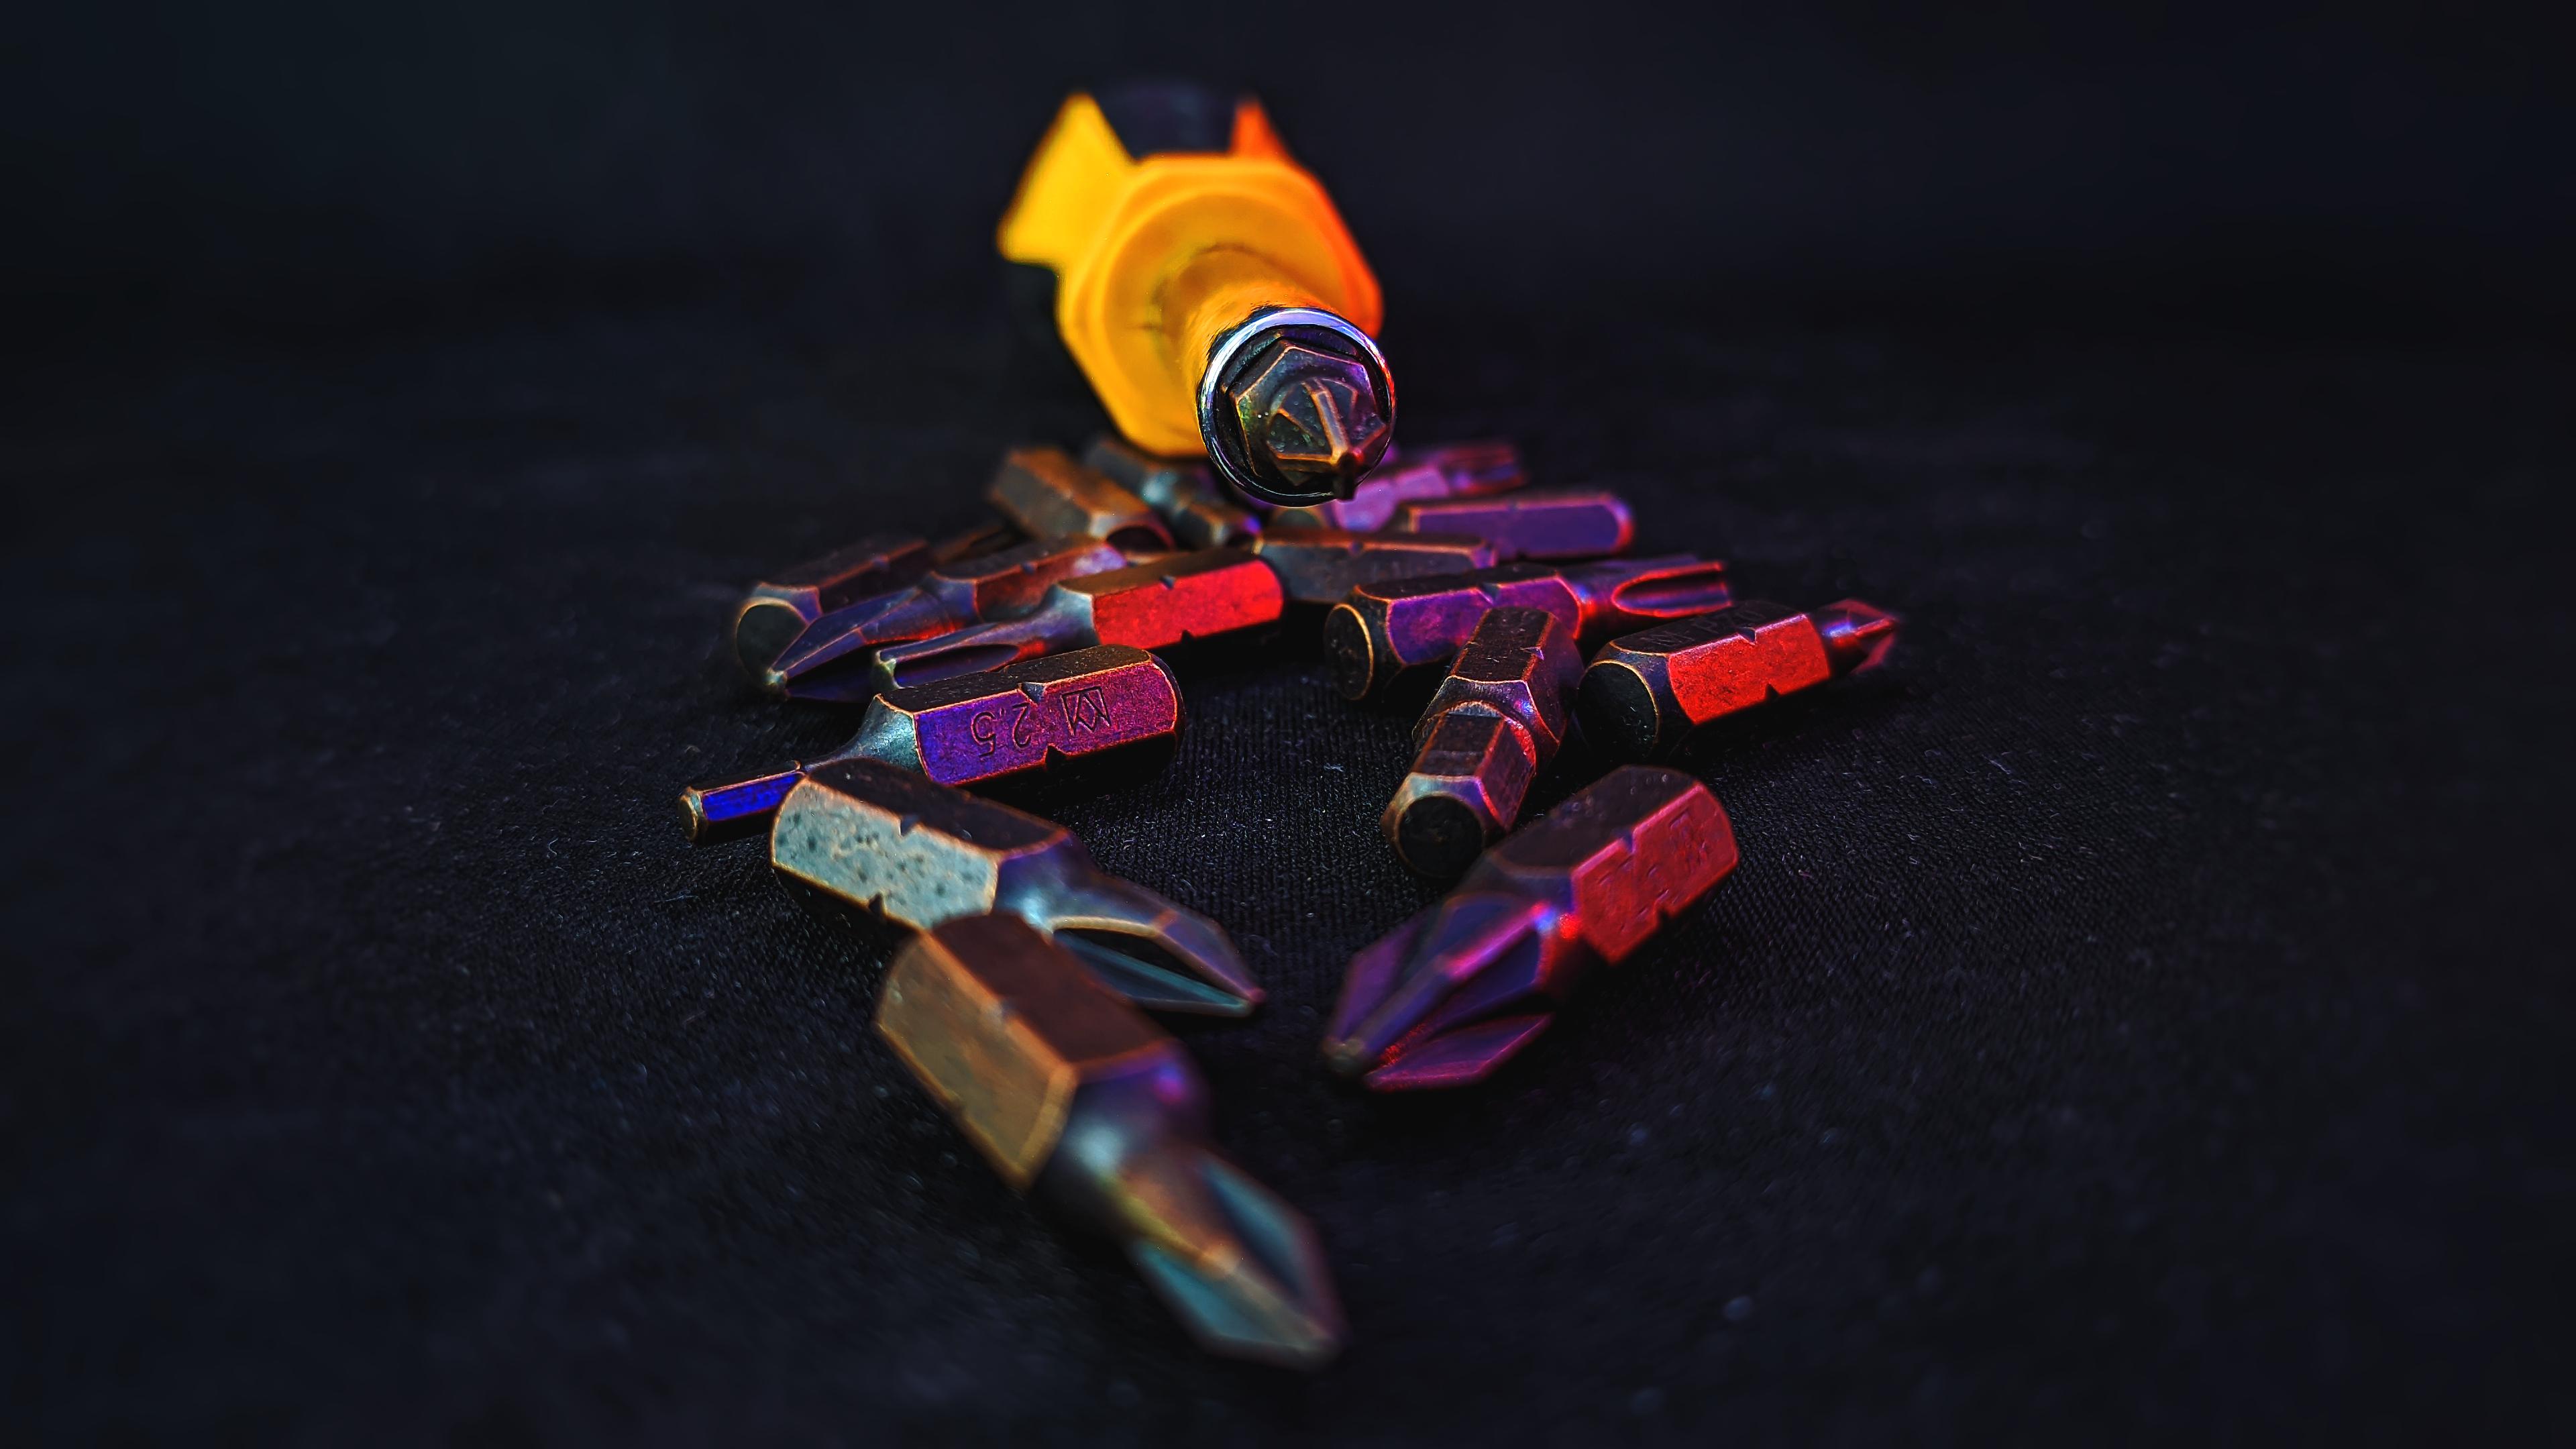 General 3840x2160 work screwdriver tools photography tech screws  4K